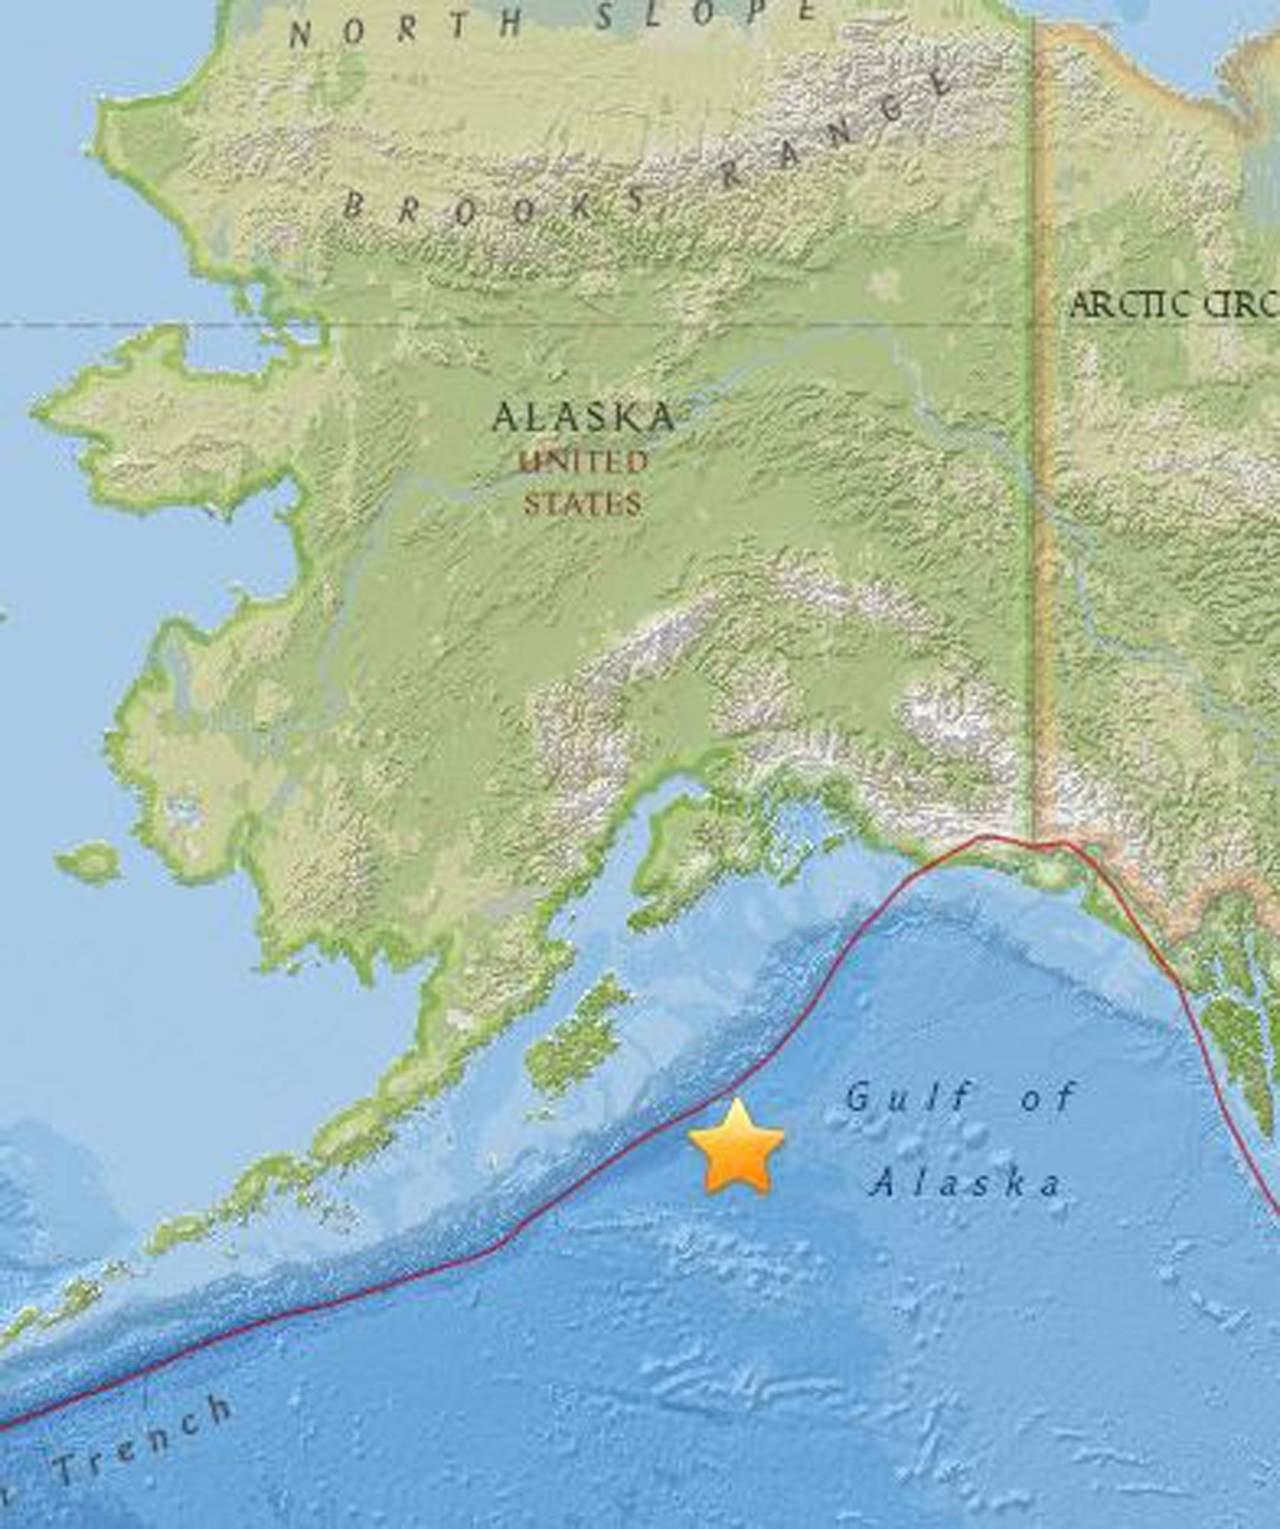 Sismo de 7.9 grados en Alaska provoca alerta de tsunami